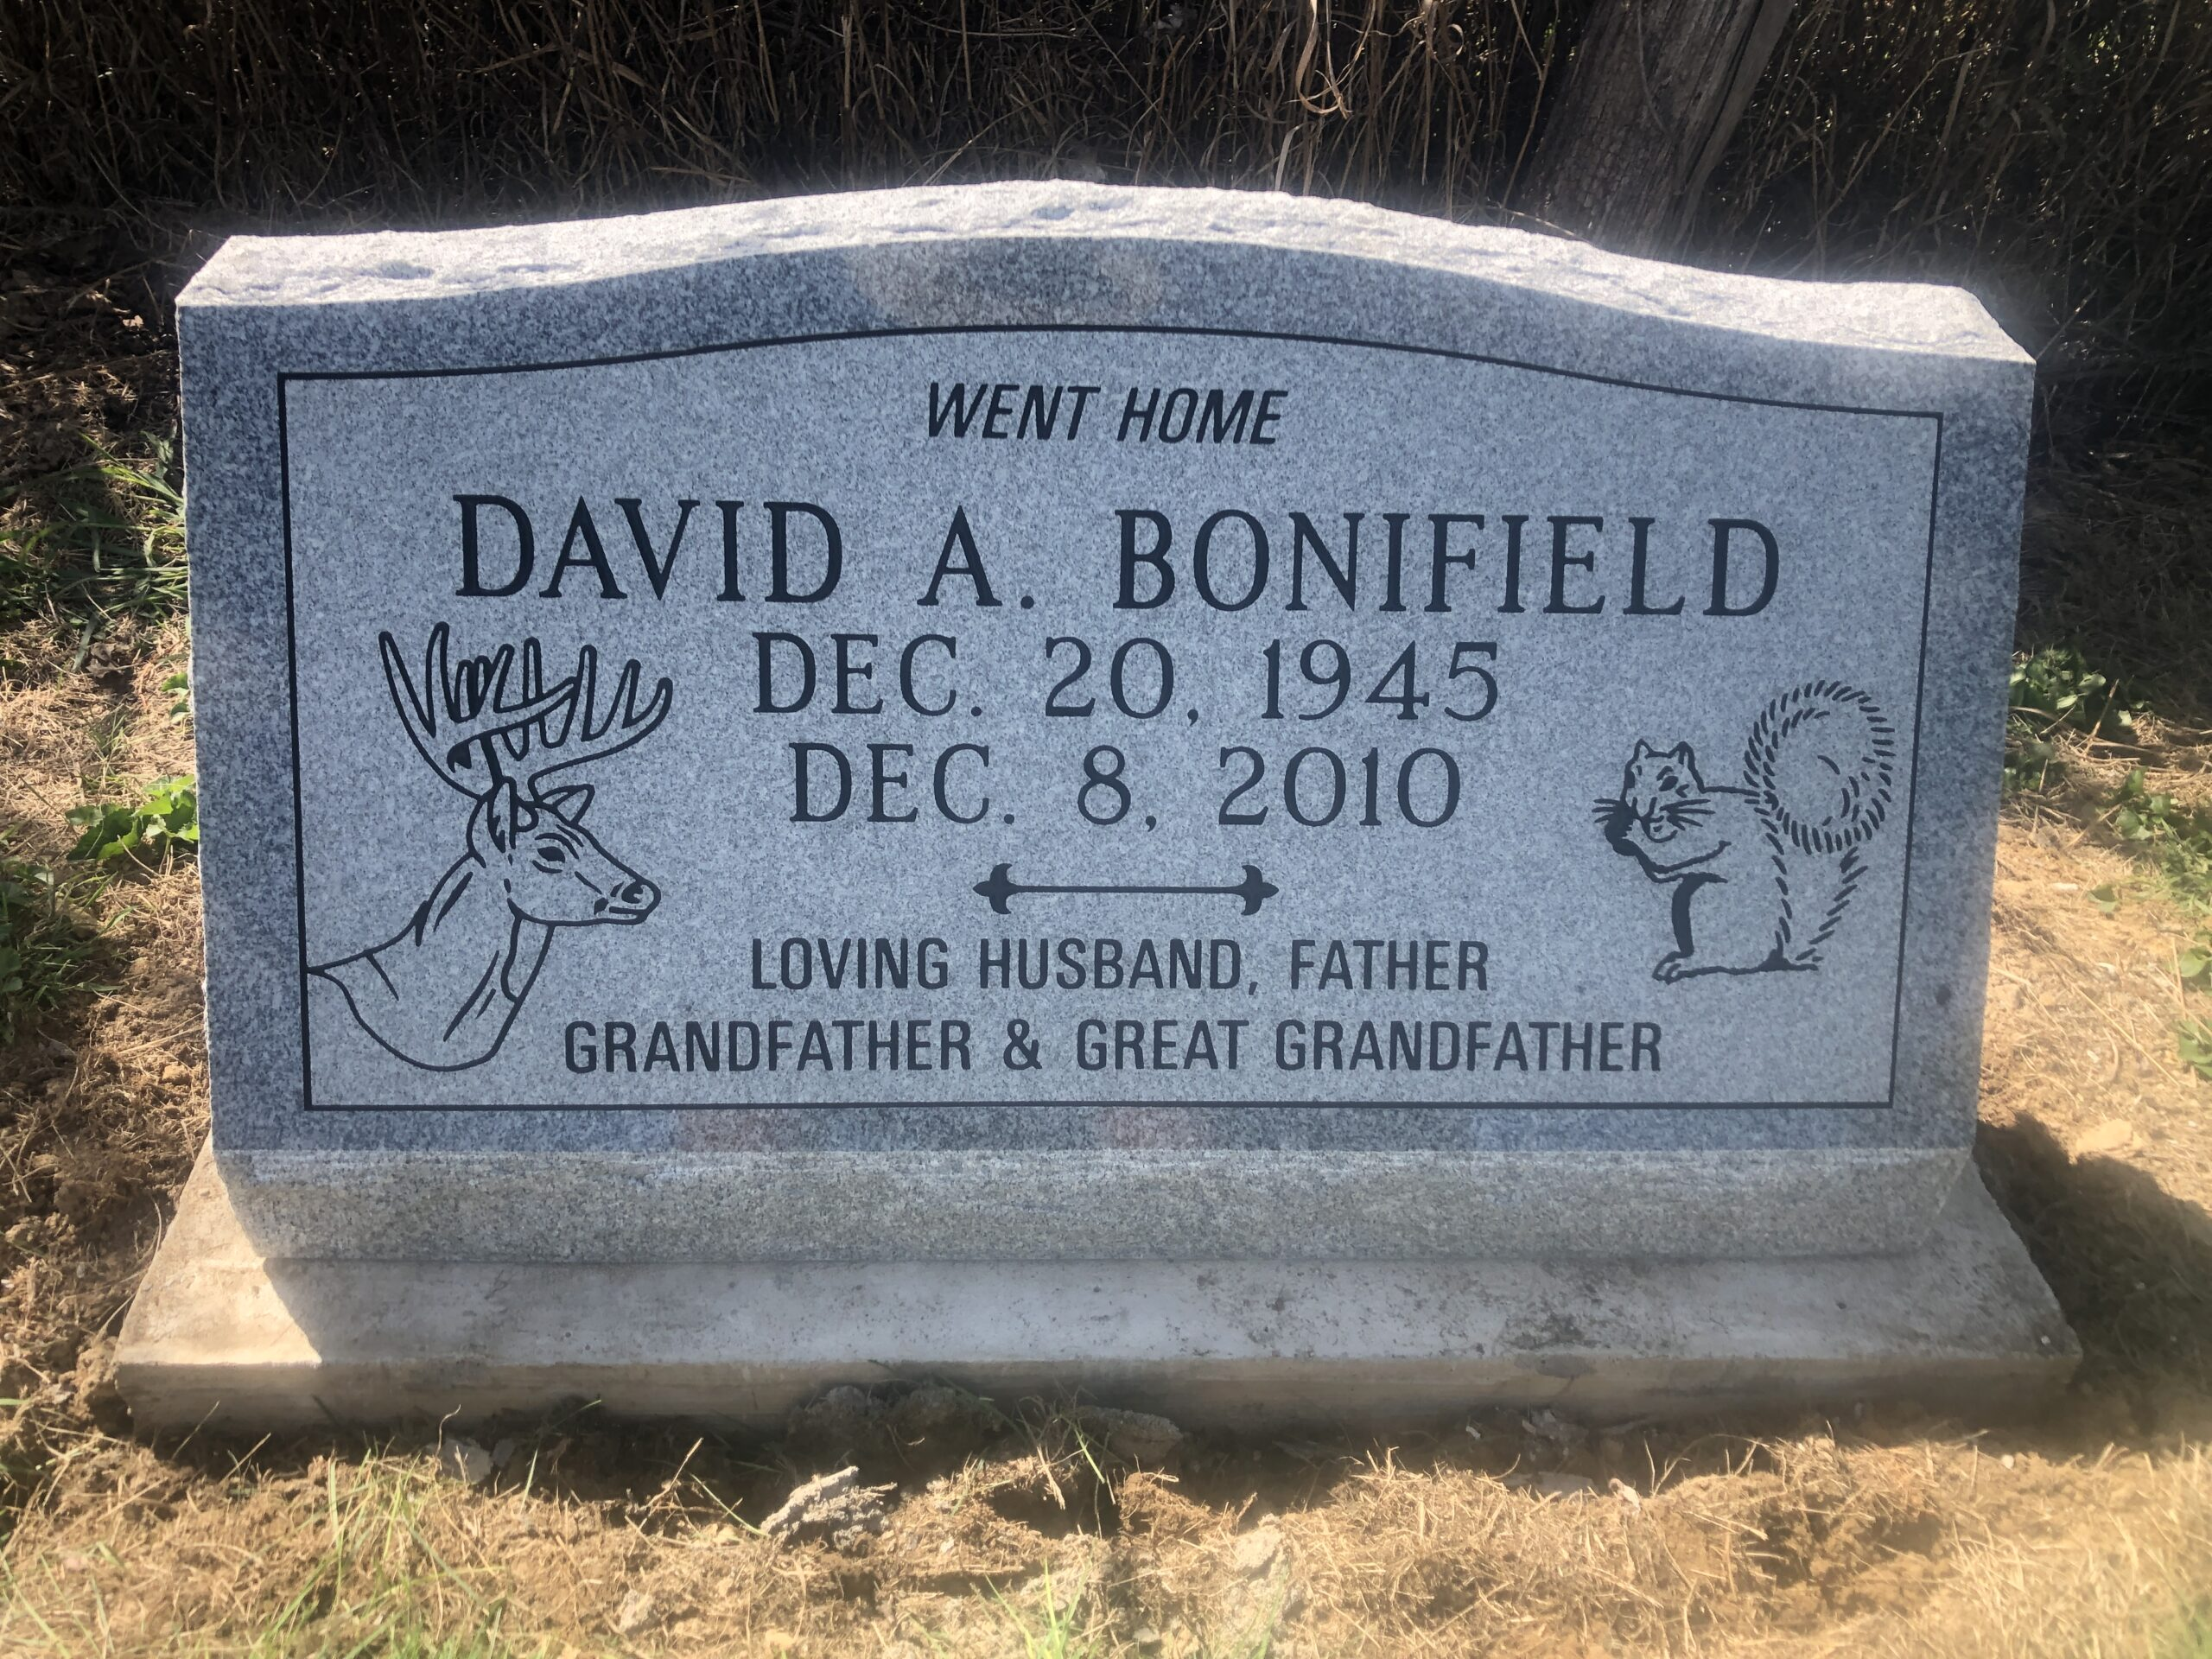 Bonifield, David A. - Mt. Sterling Cem., 2-6, Gray